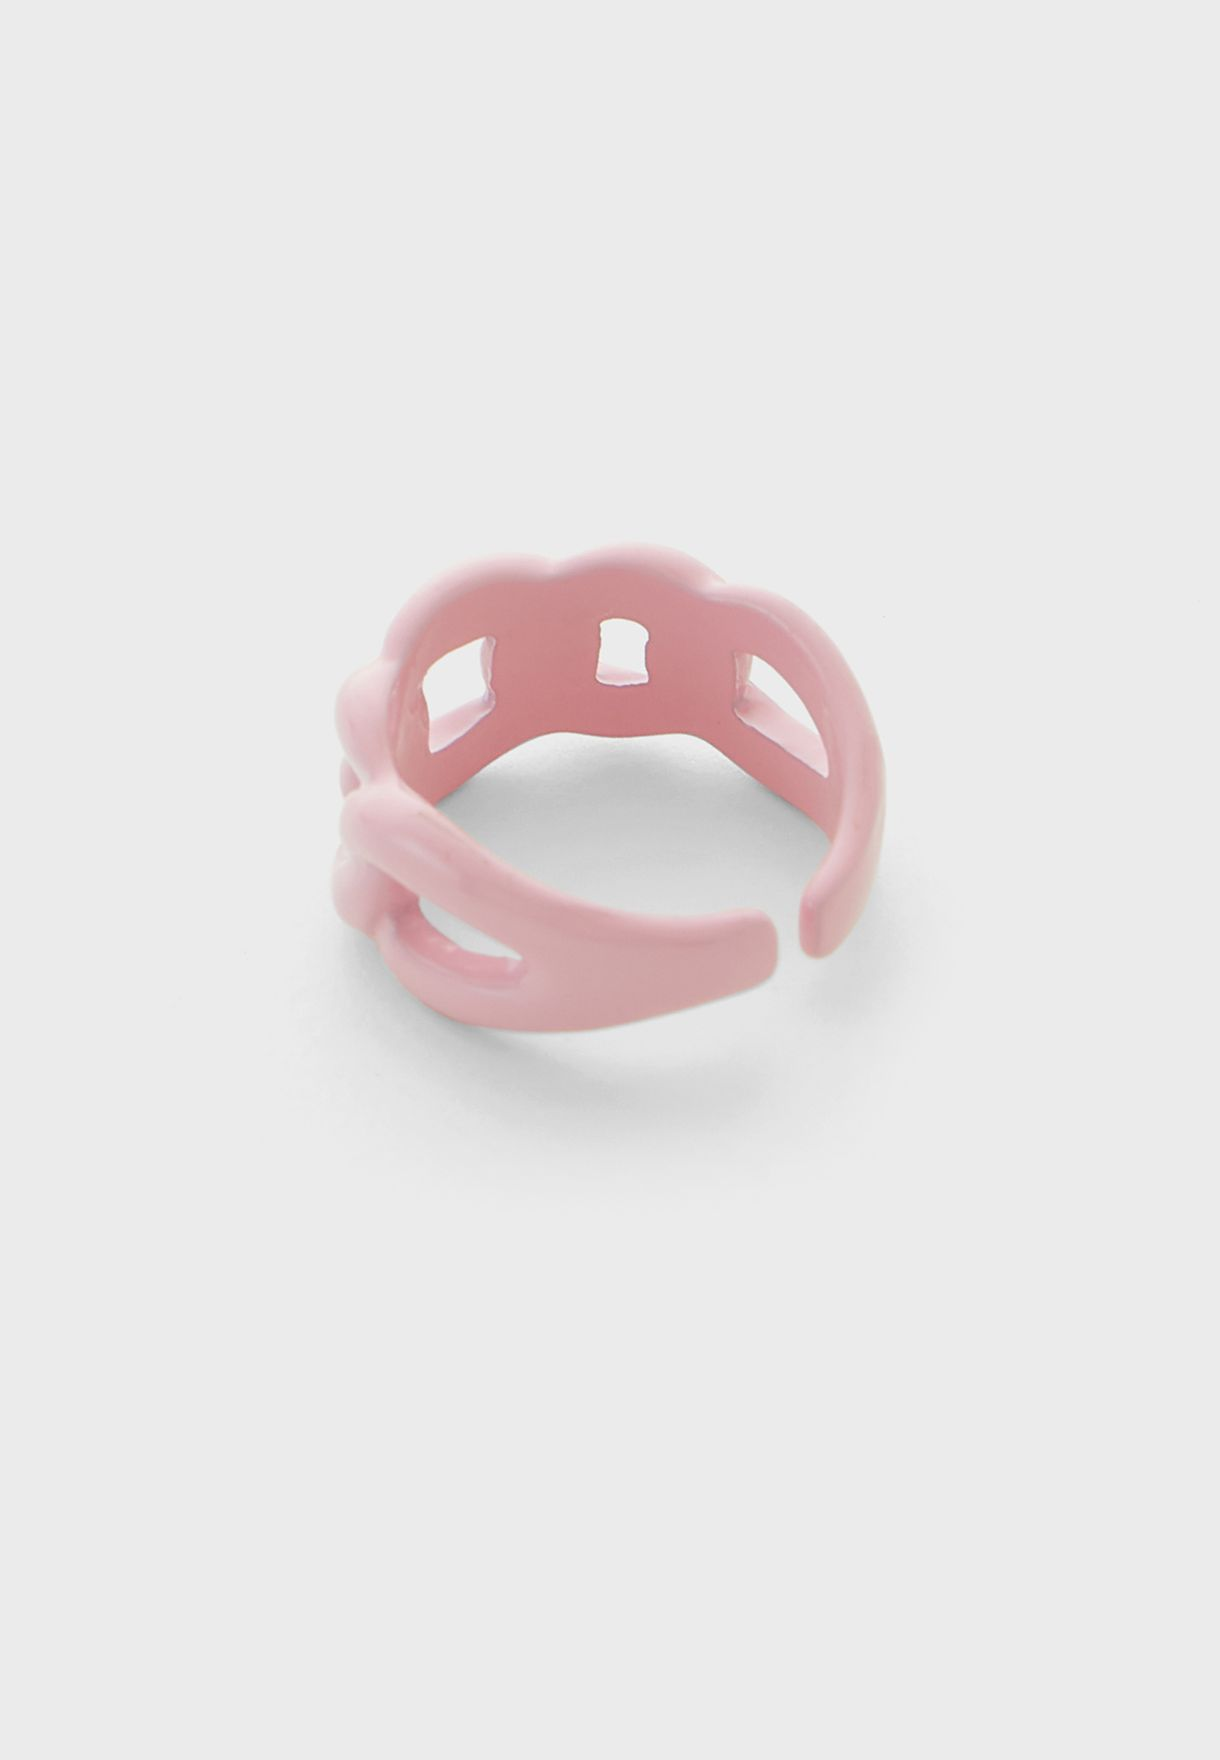 Chain Acrylic Ring